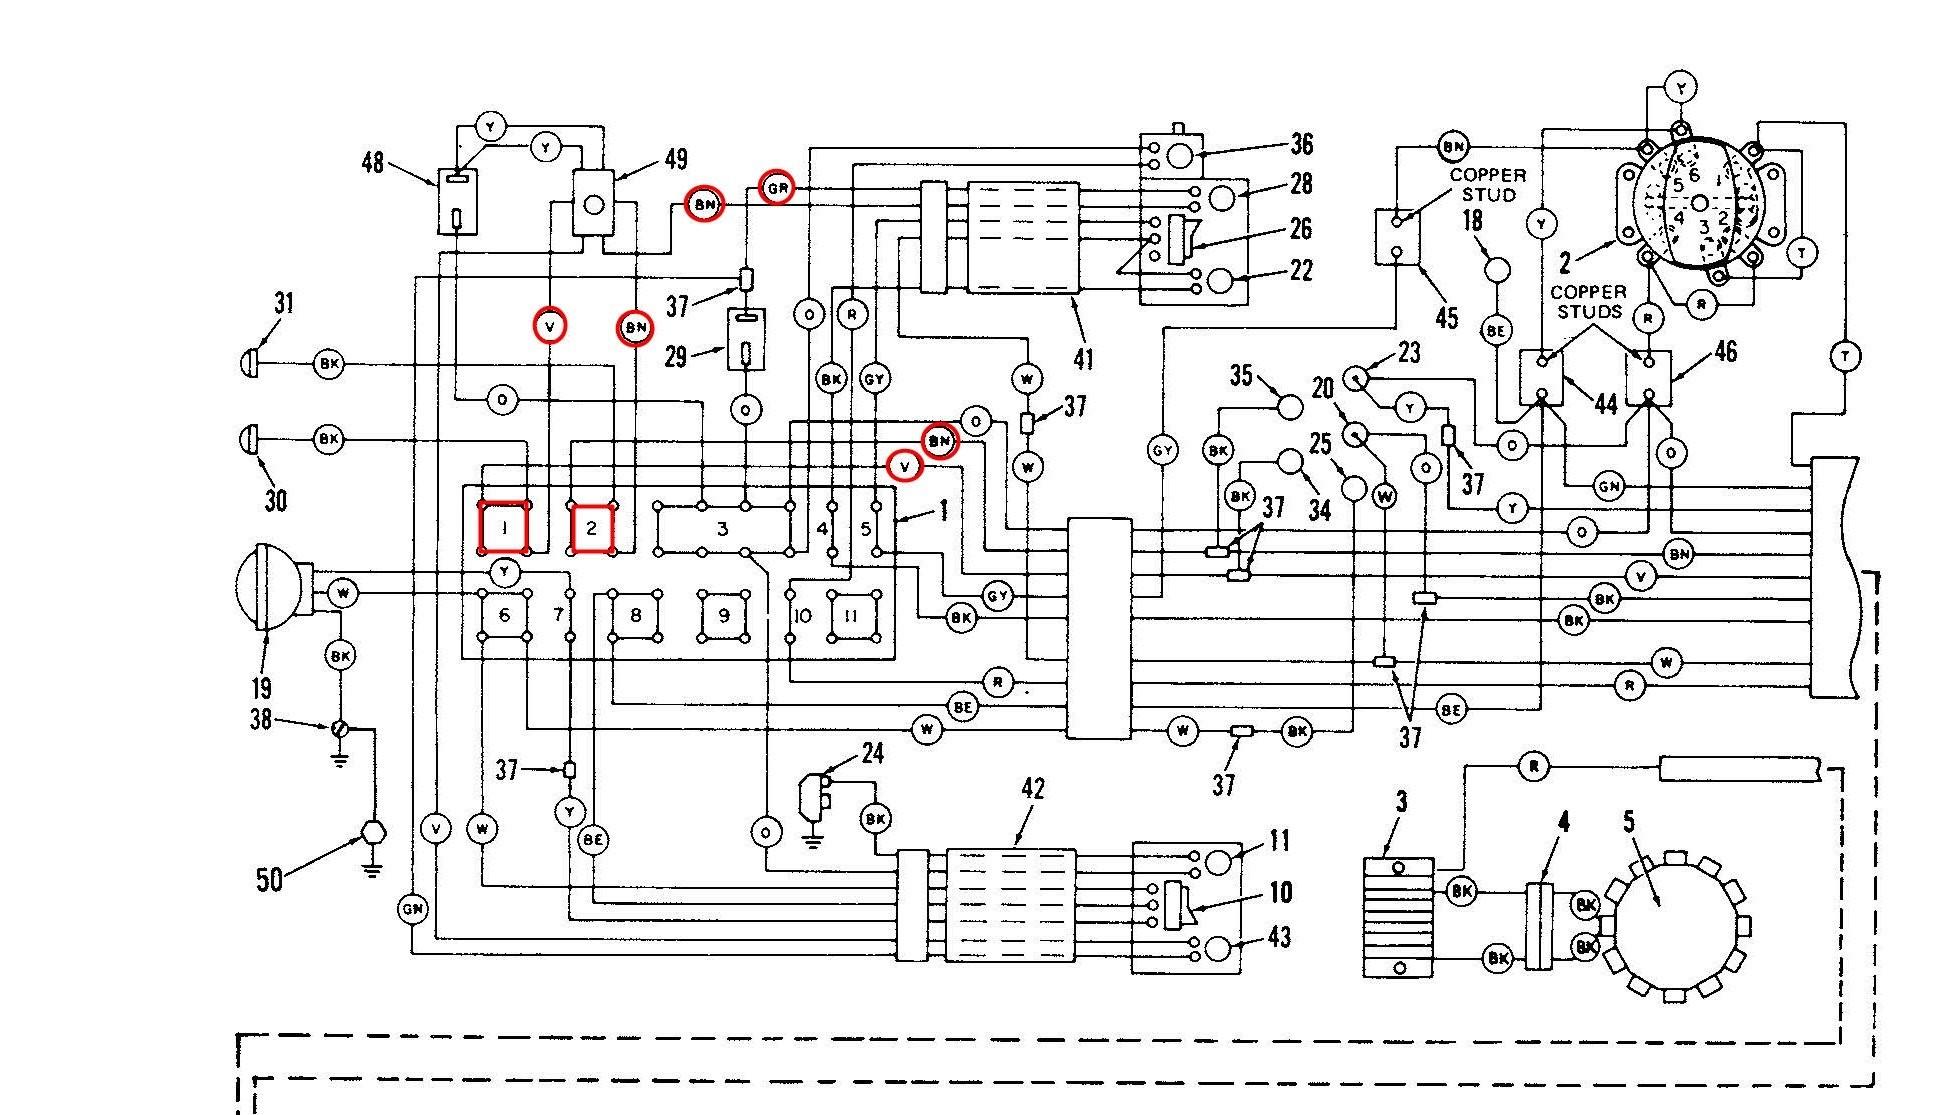 1970 Harley Shovelhead Wiring Schematic Free Diagram] 1973 Flh Wiring Diagram Dash Full Version Hd Of 1970 Harley Shovelhead Wiring Schematic